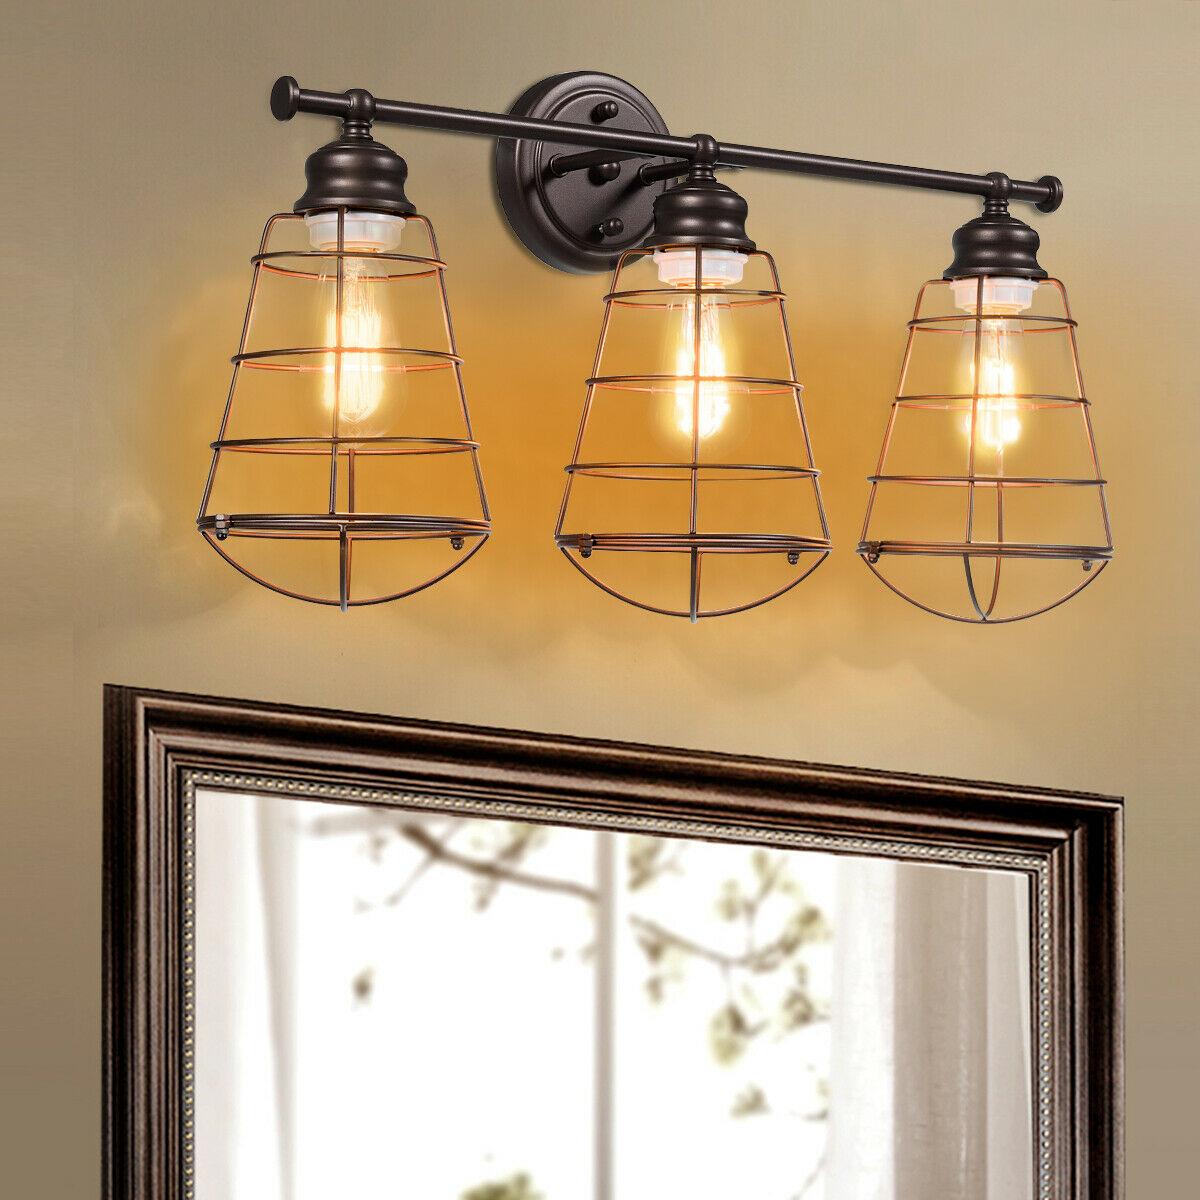 3-Light Vanity Lamp Bathroom Fixture with Metal Wire Cage